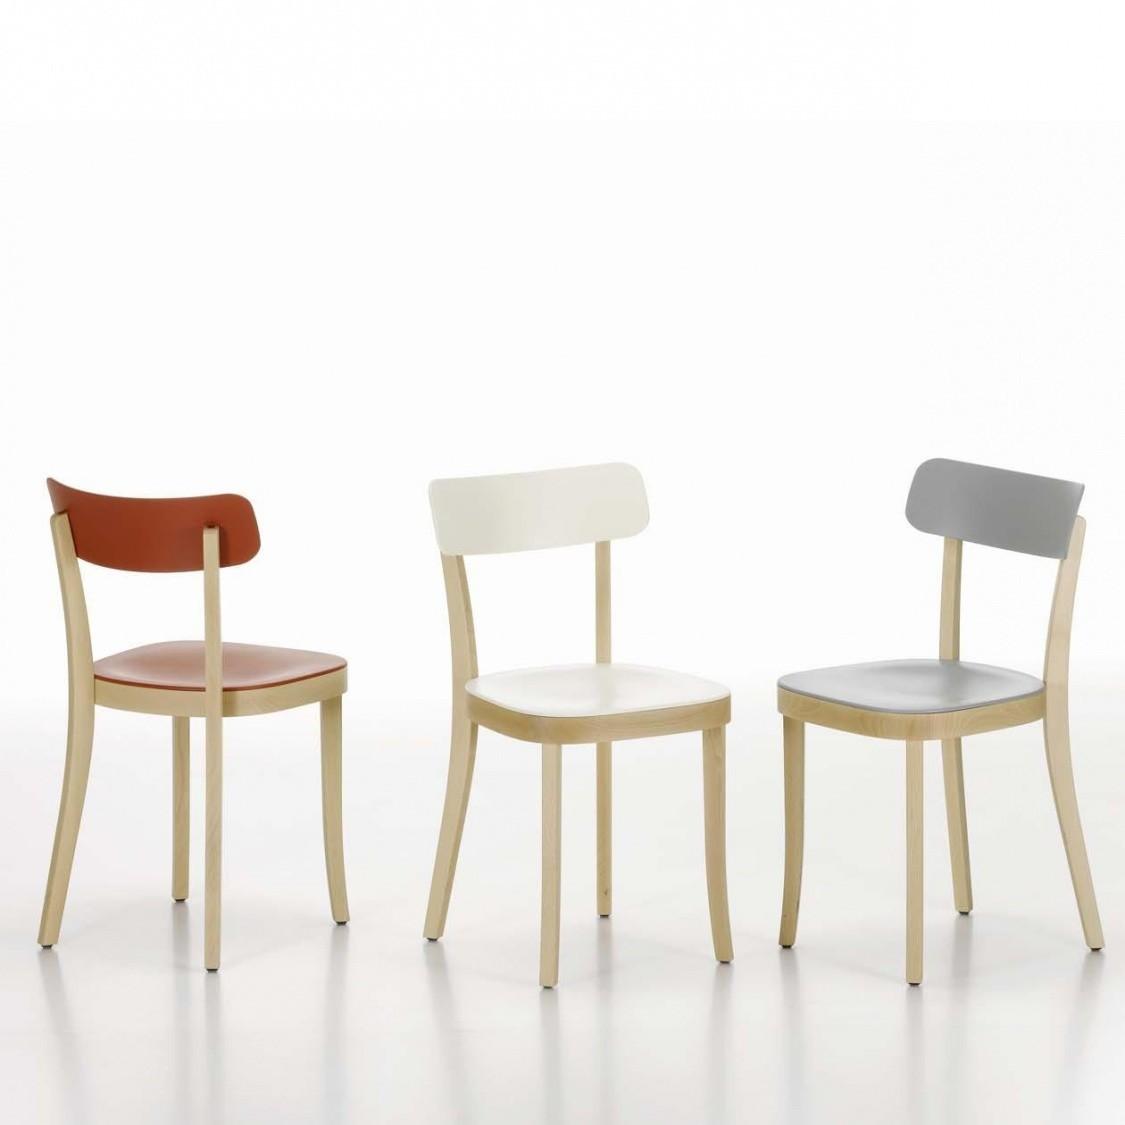 Vitra basel chair stuhl ambientedirect - Designer stuhl vitra ...